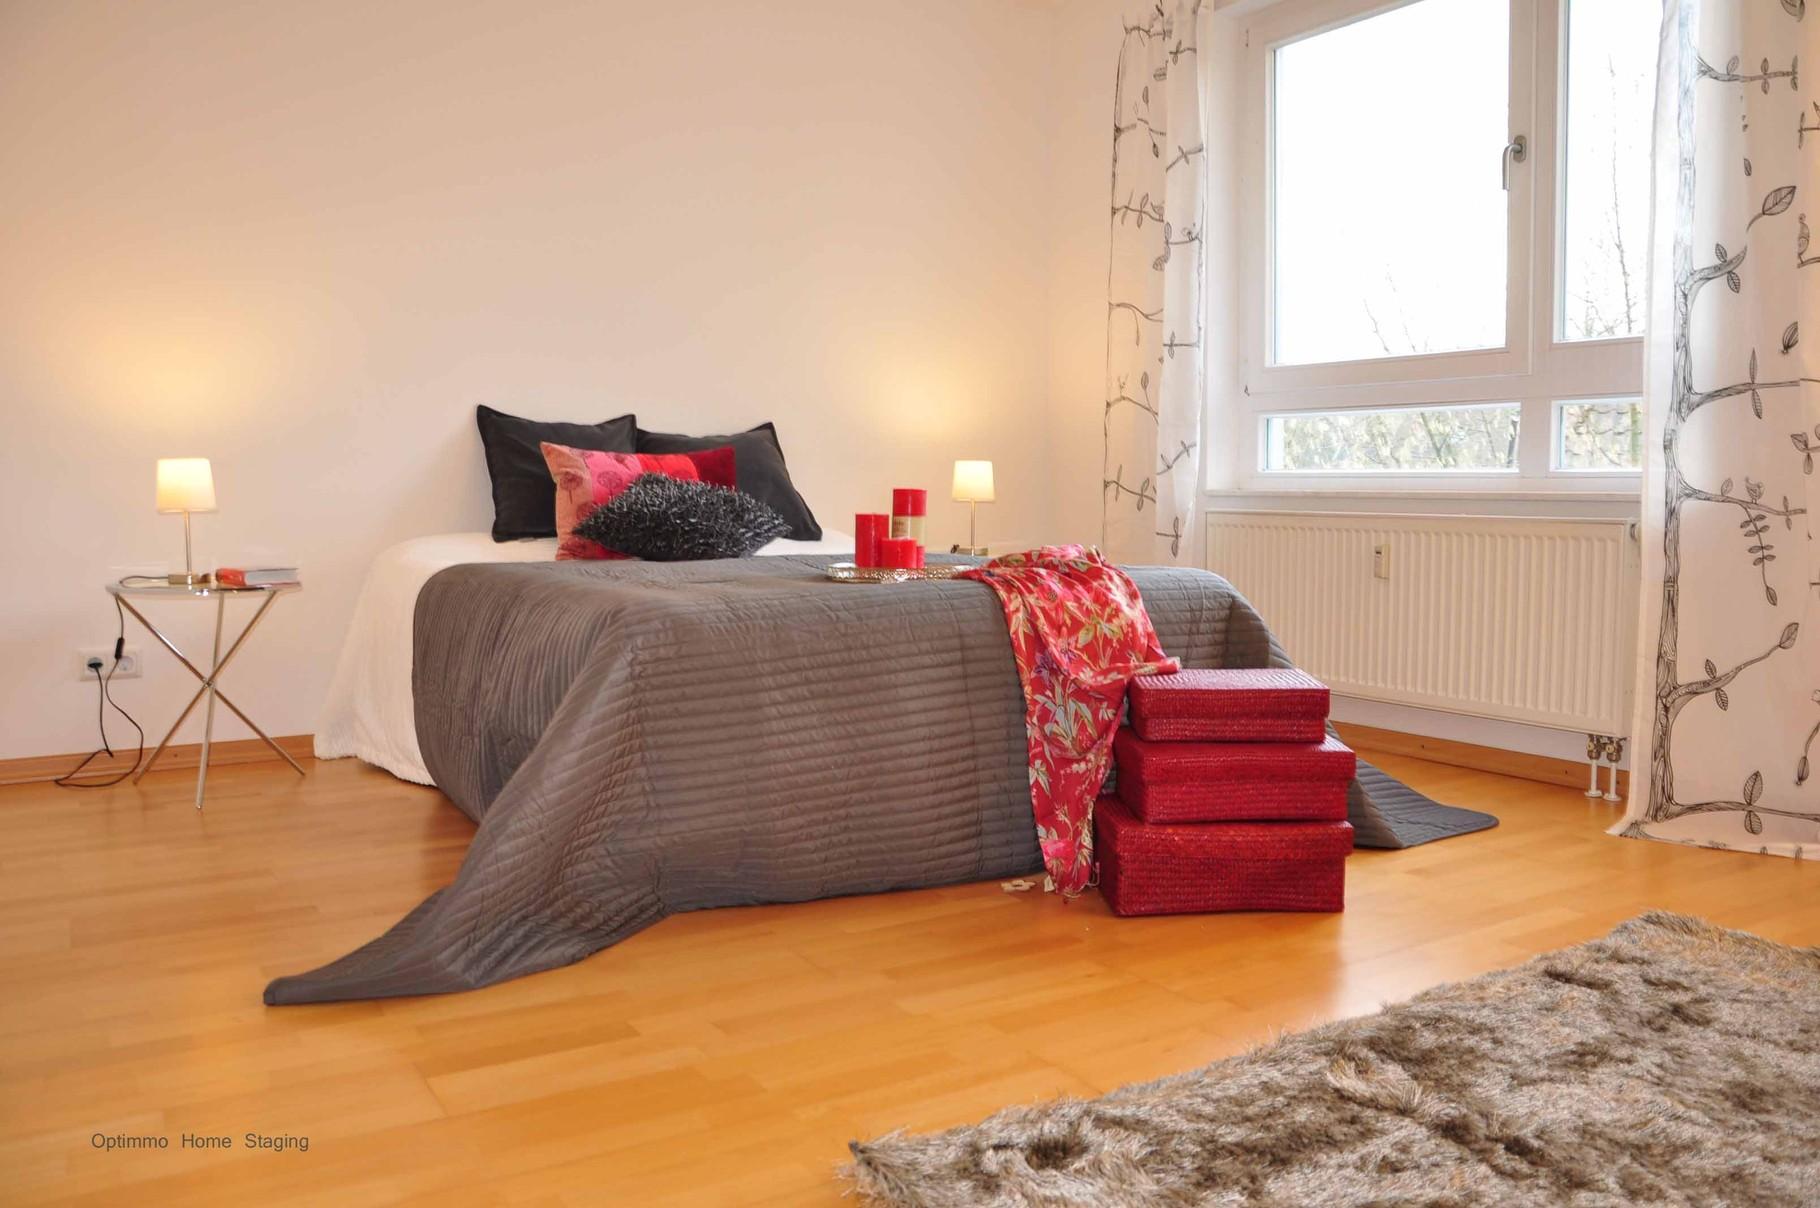 3 zimmer maisonette wohnung hamburg marienthal optimmo. Black Bedroom Furniture Sets. Home Design Ideas